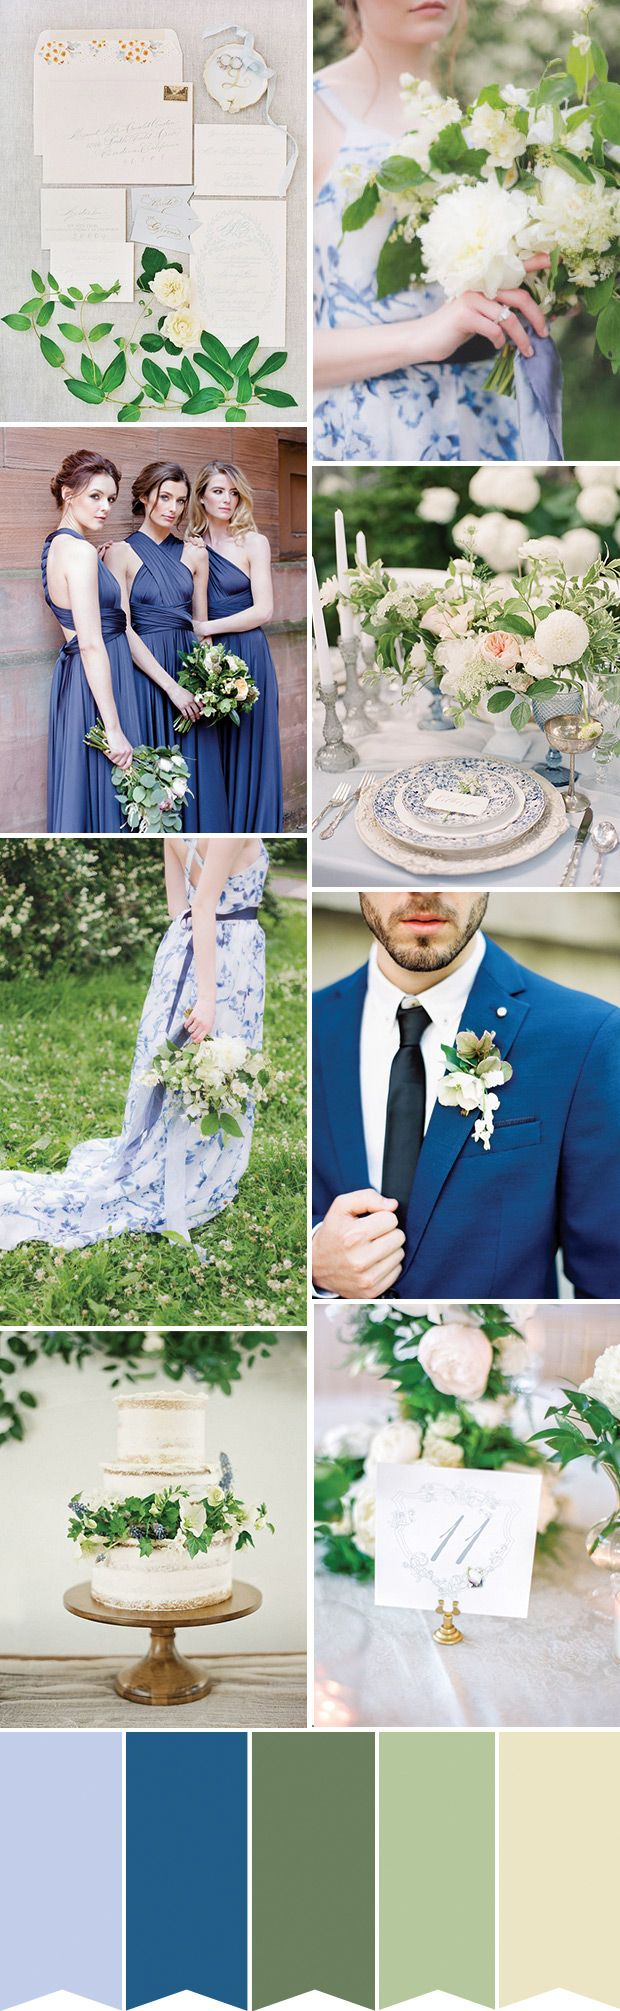 360 Best Wedding Color Palettes Images On Pinterest